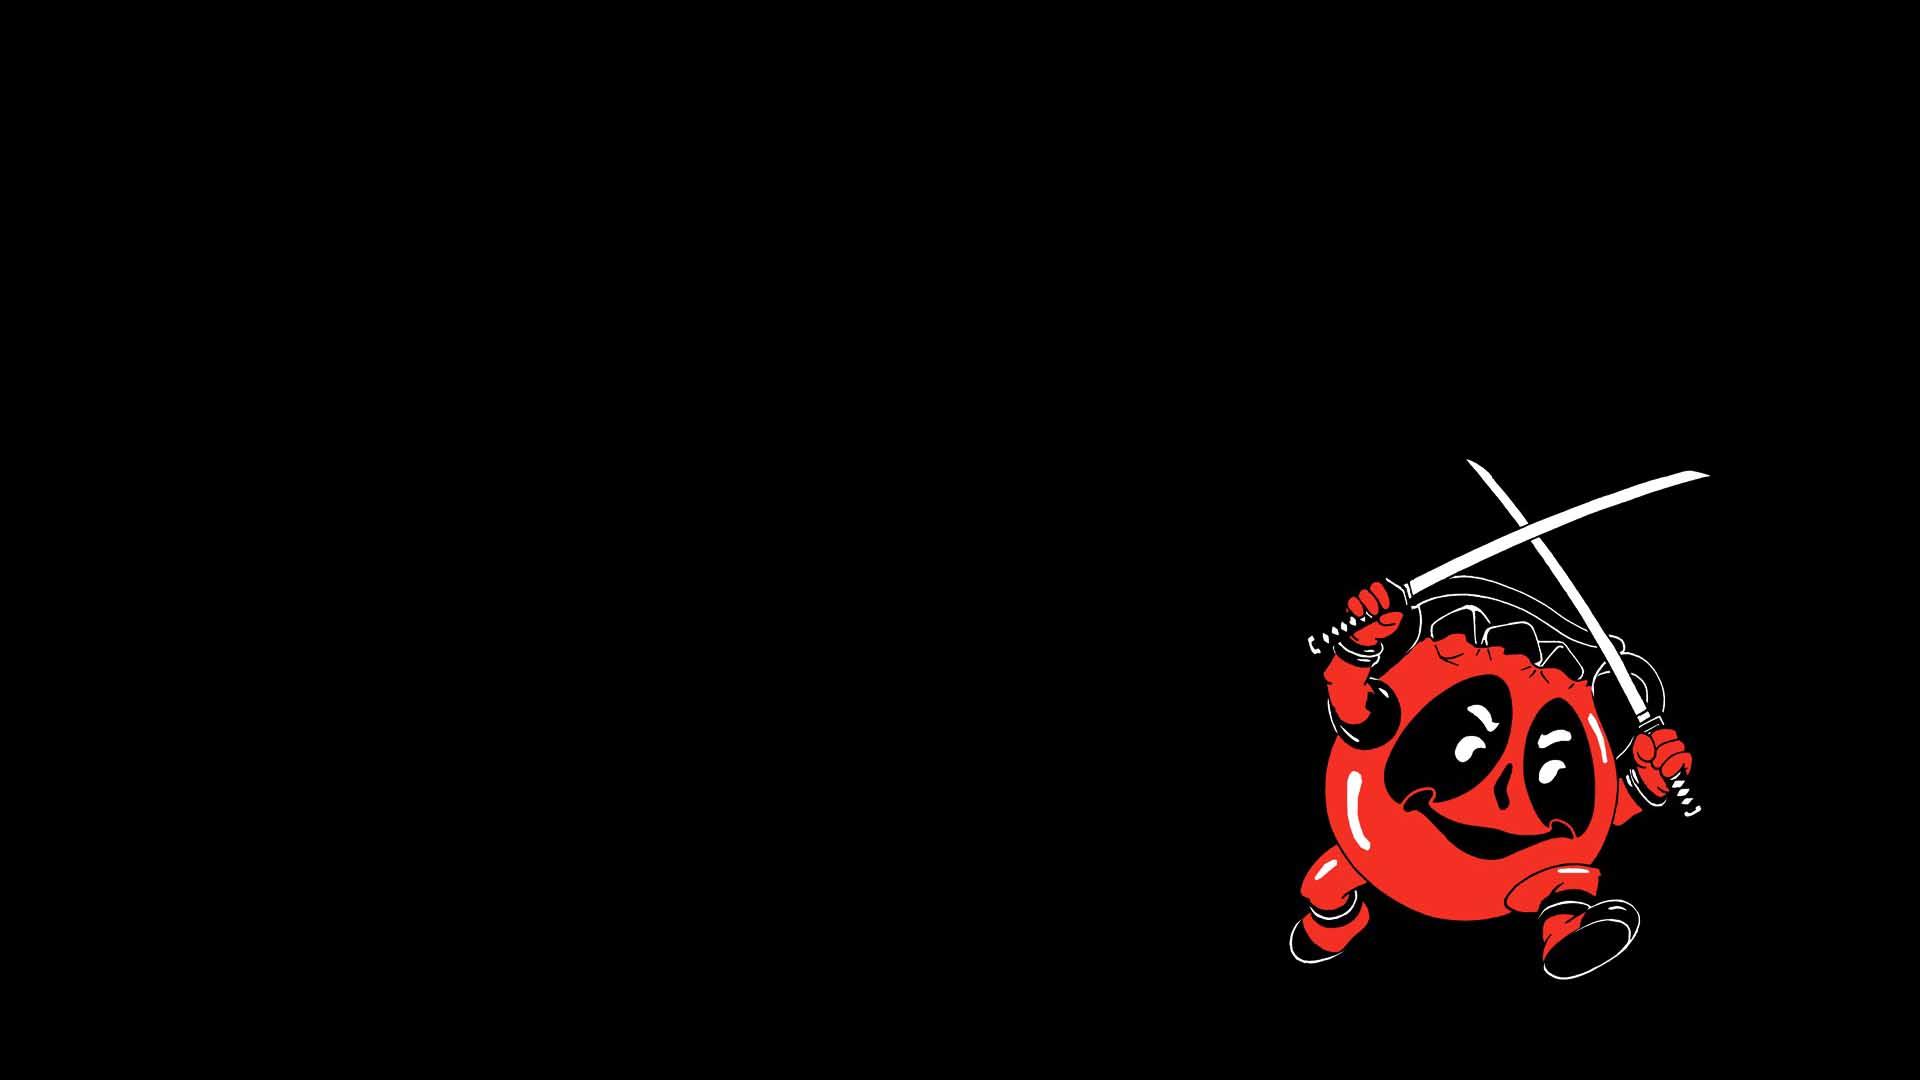 Cool Deadpool Wallpapers HD download 1920x1080